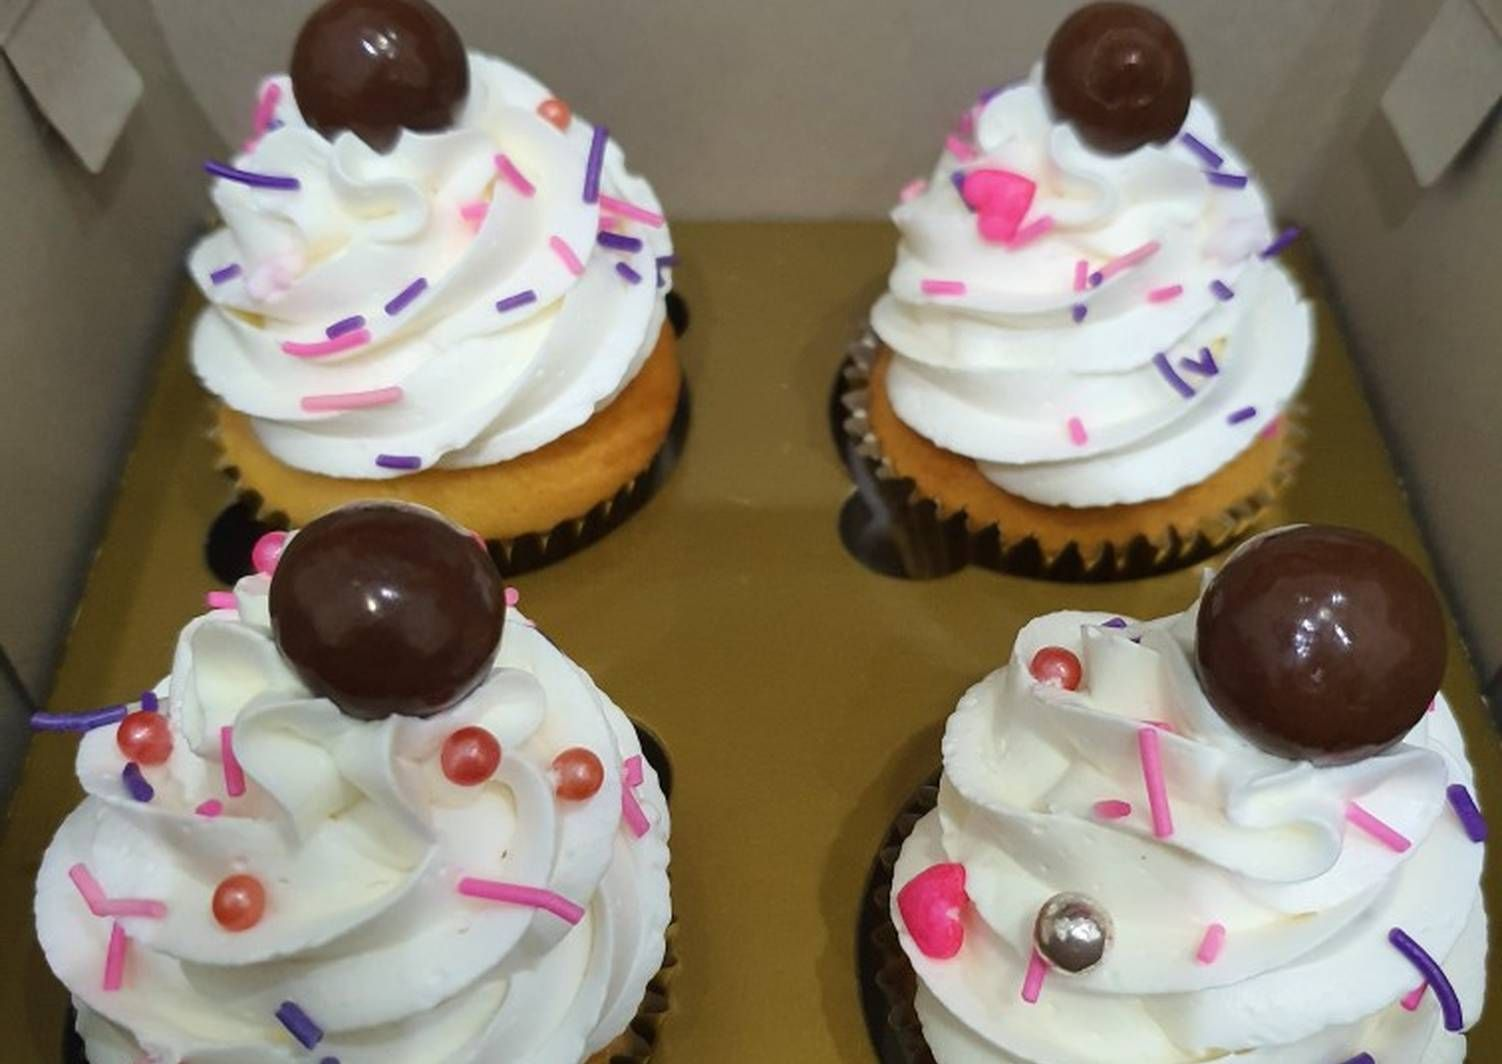 Resep Cupcake Ncc Anti Gagal Oleh Juan S Kitchen Resep Resep Kue Kue Resep